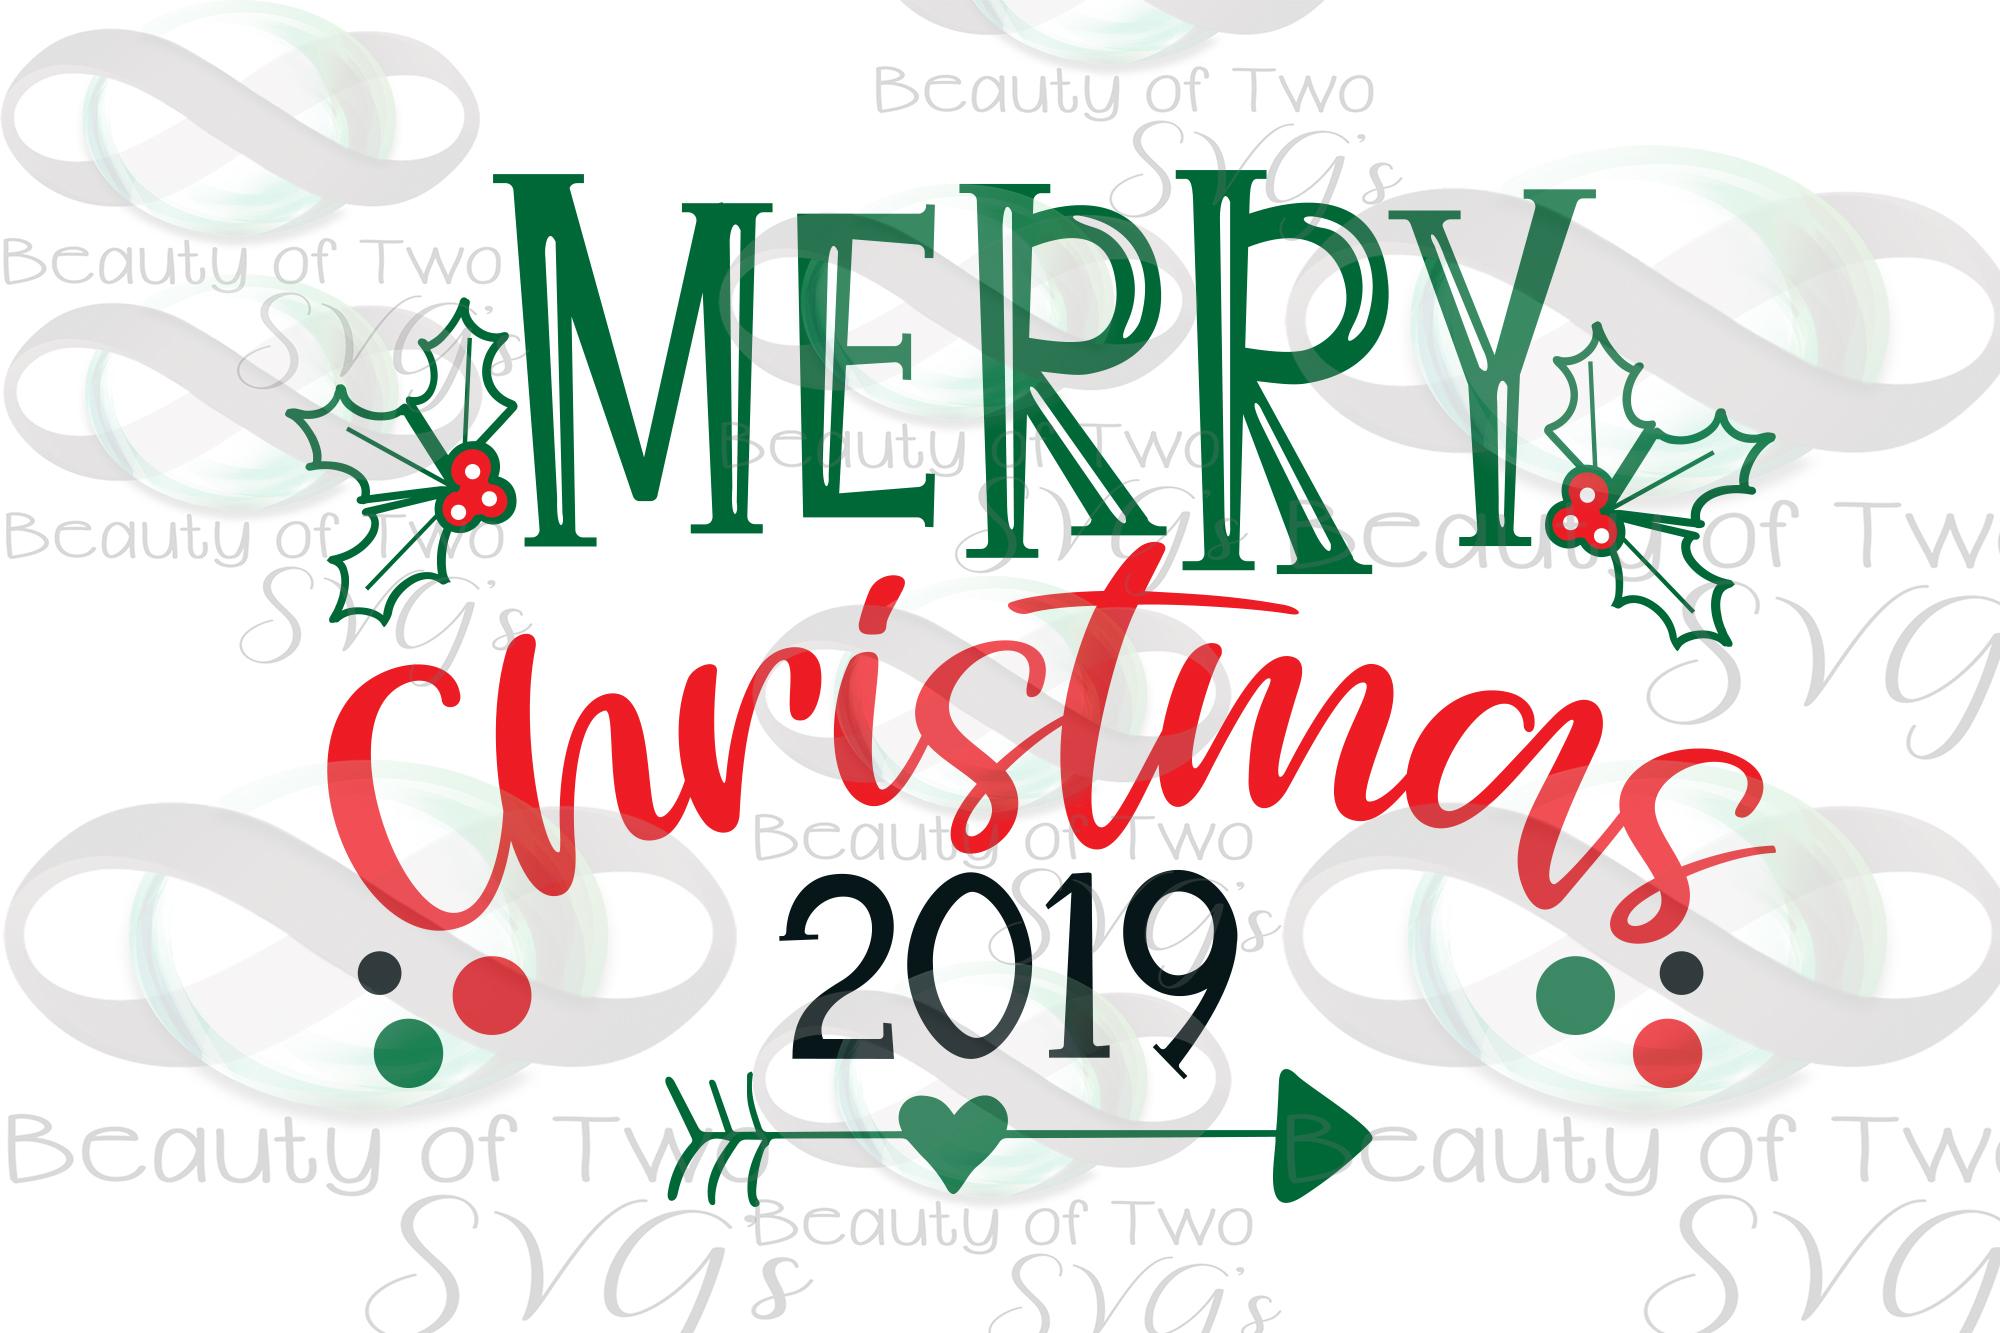 Merry Christmas 2019 Ornament svg, Christmas svg, Ornament example image 2